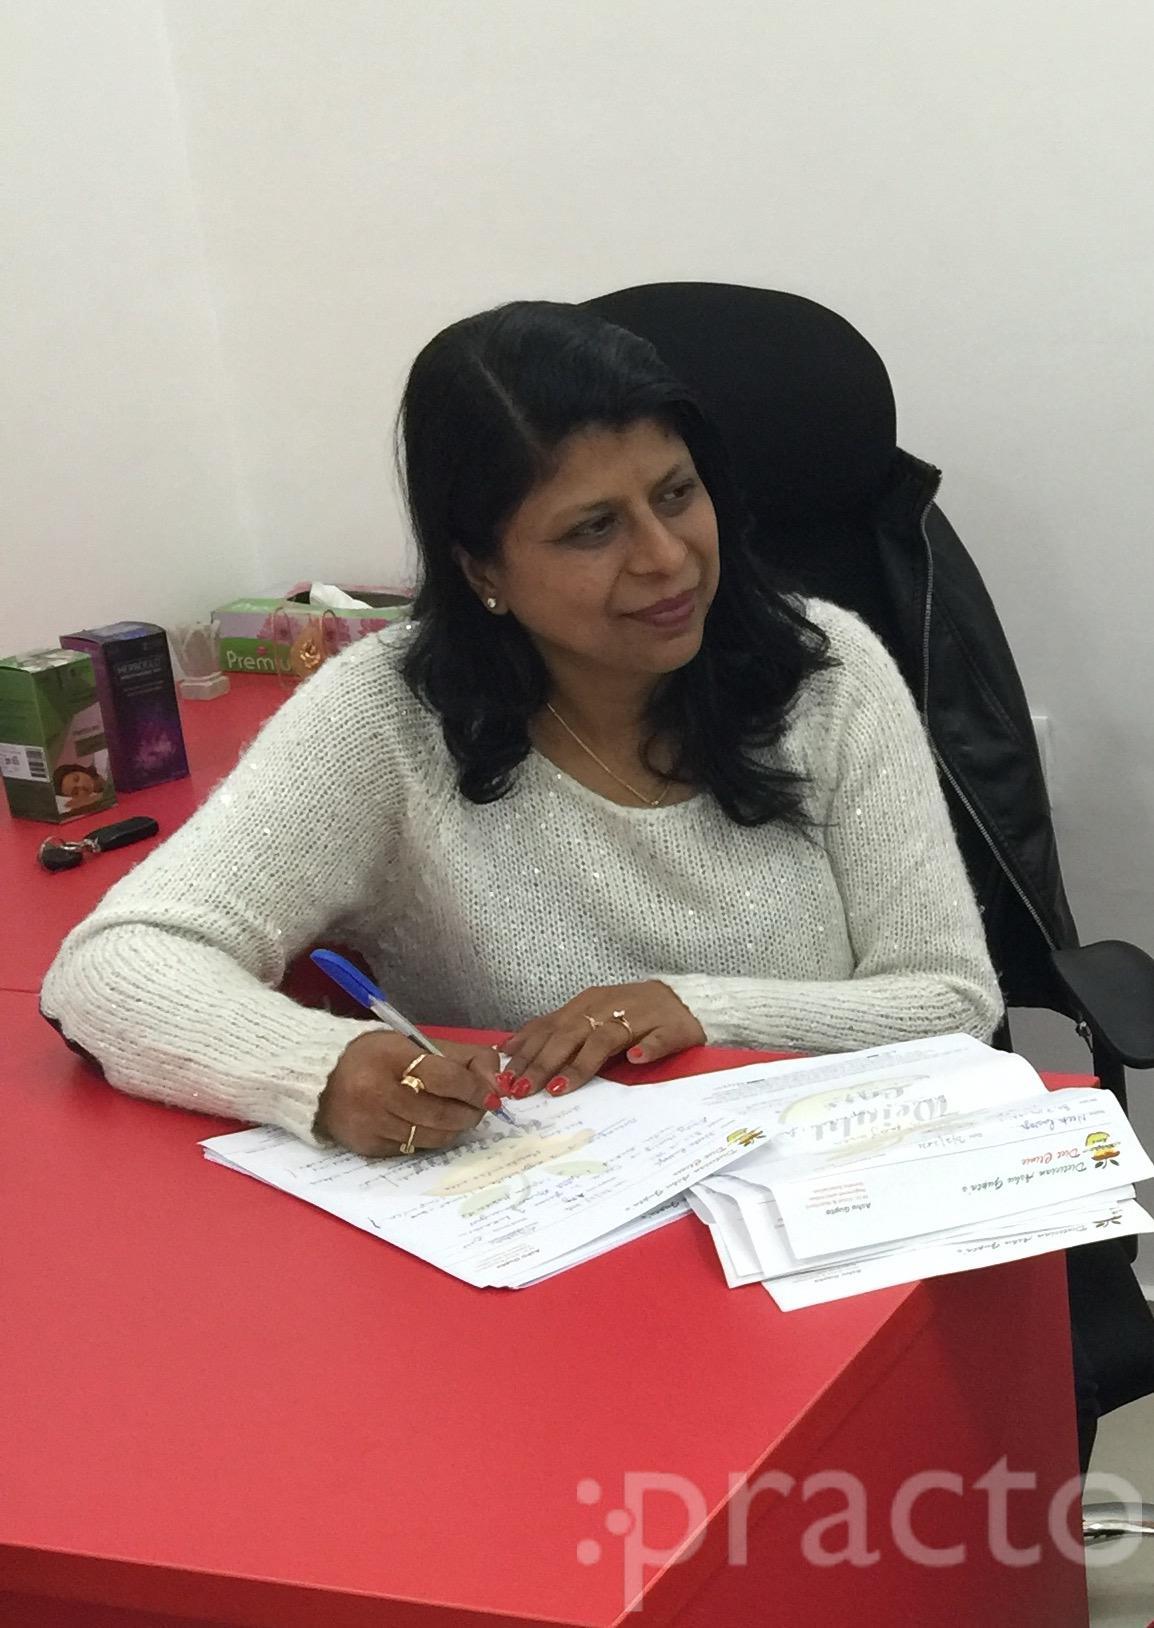 Ms. Ashu Gupta - Dietitian/Nutritionist